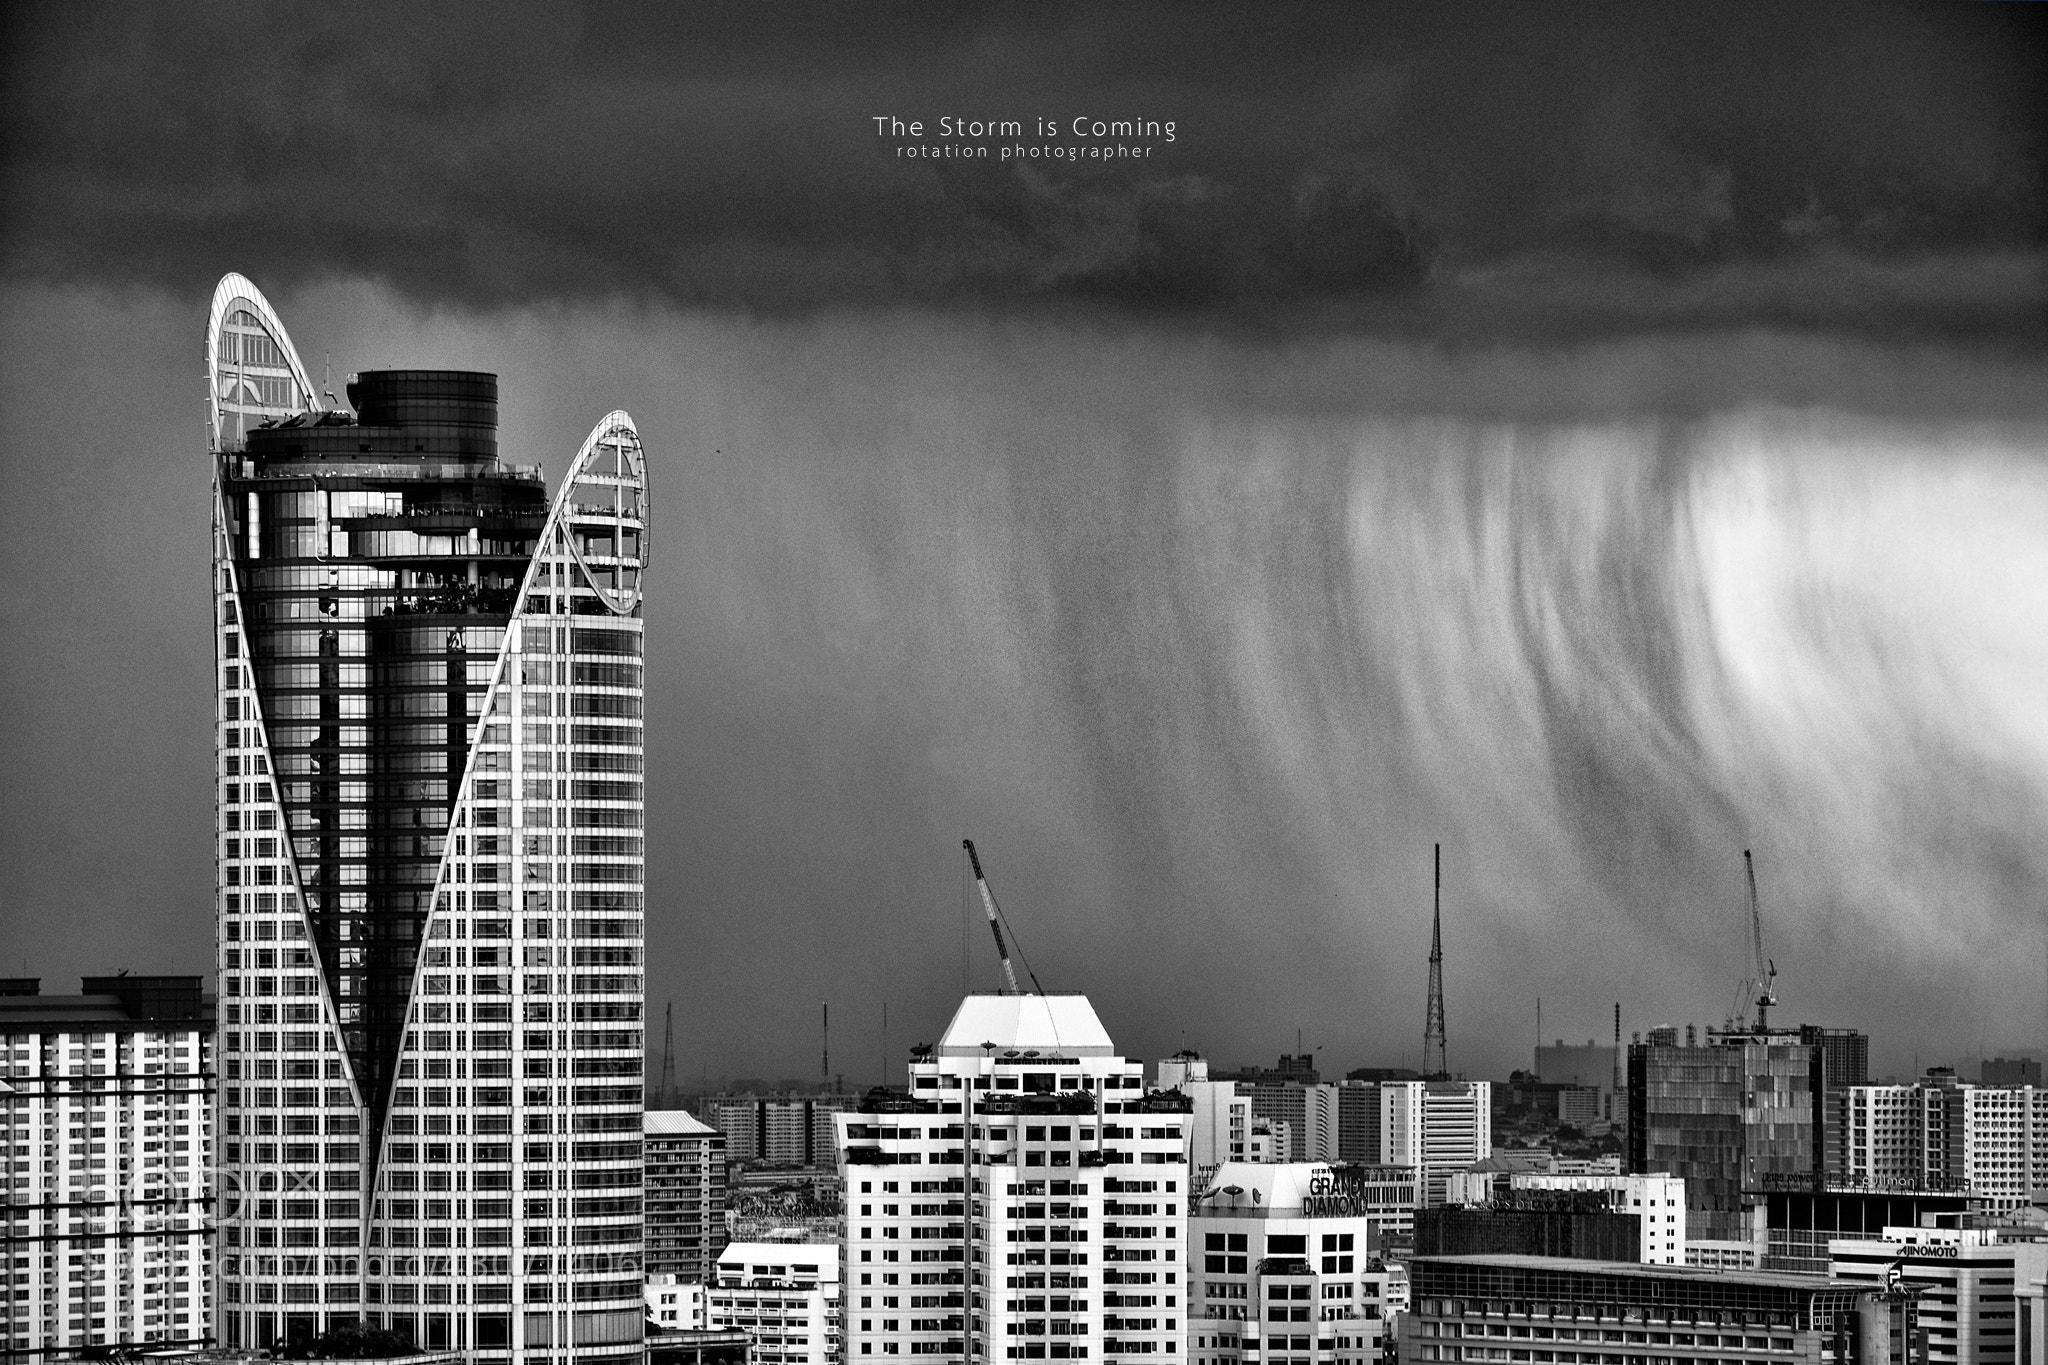 Photograph The Storm is Coming by Jirawas Teekayu on 500px